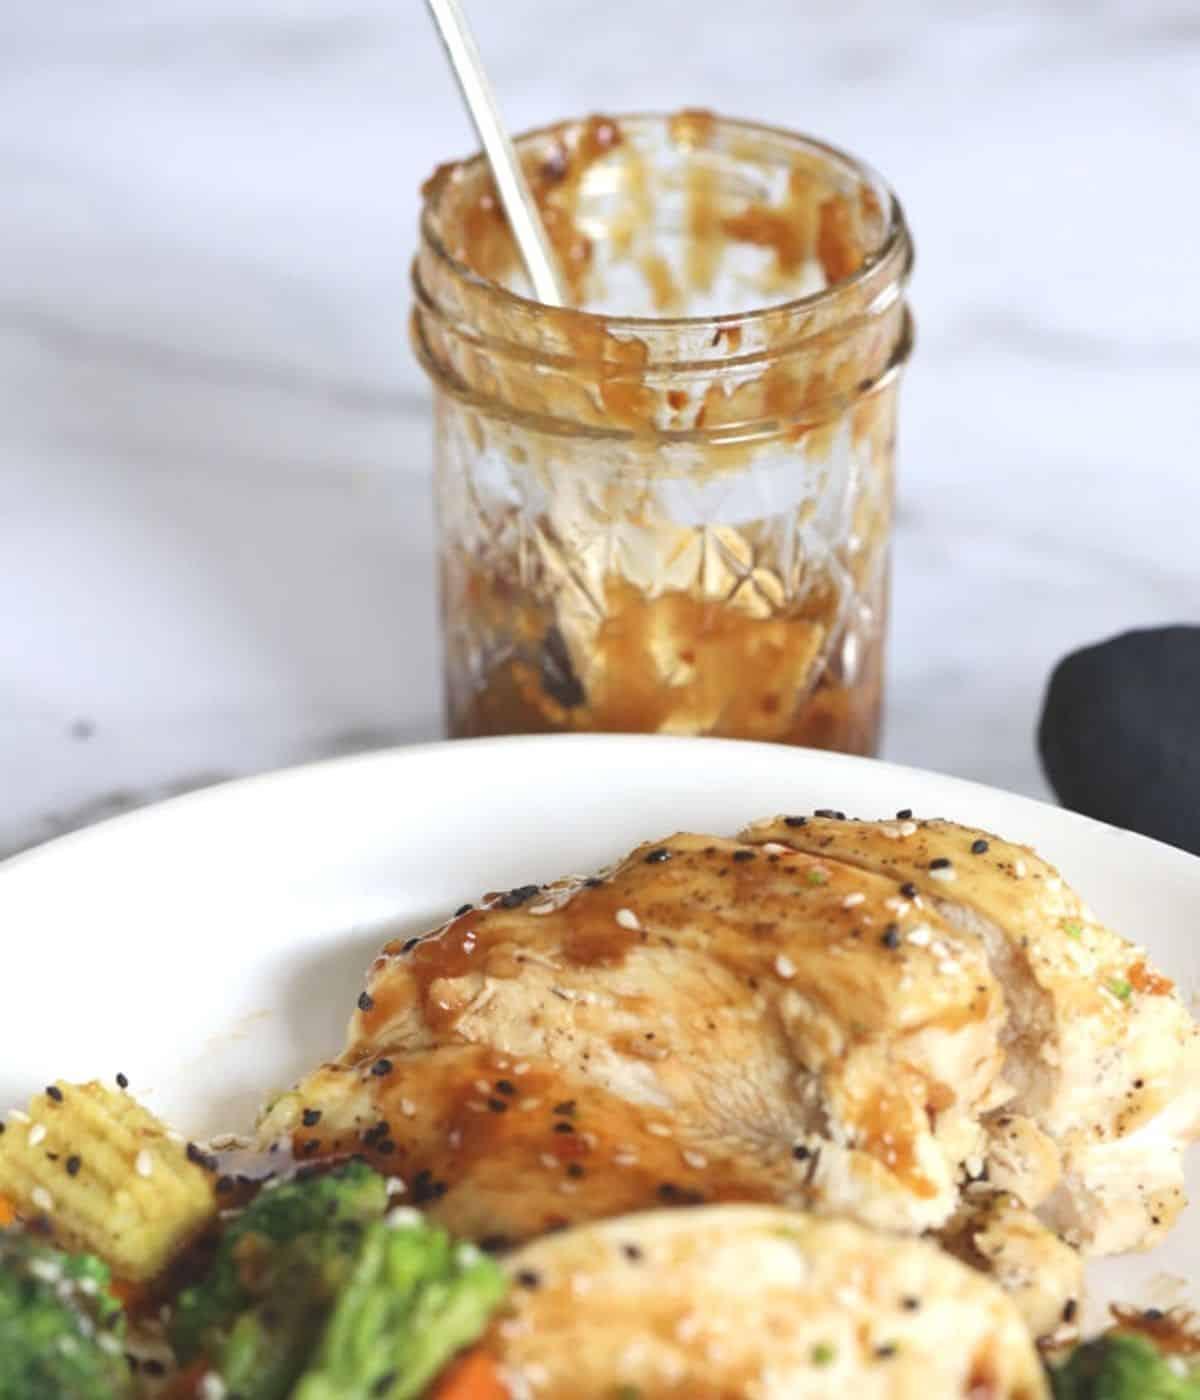 jar of sauce with stir fry chicken